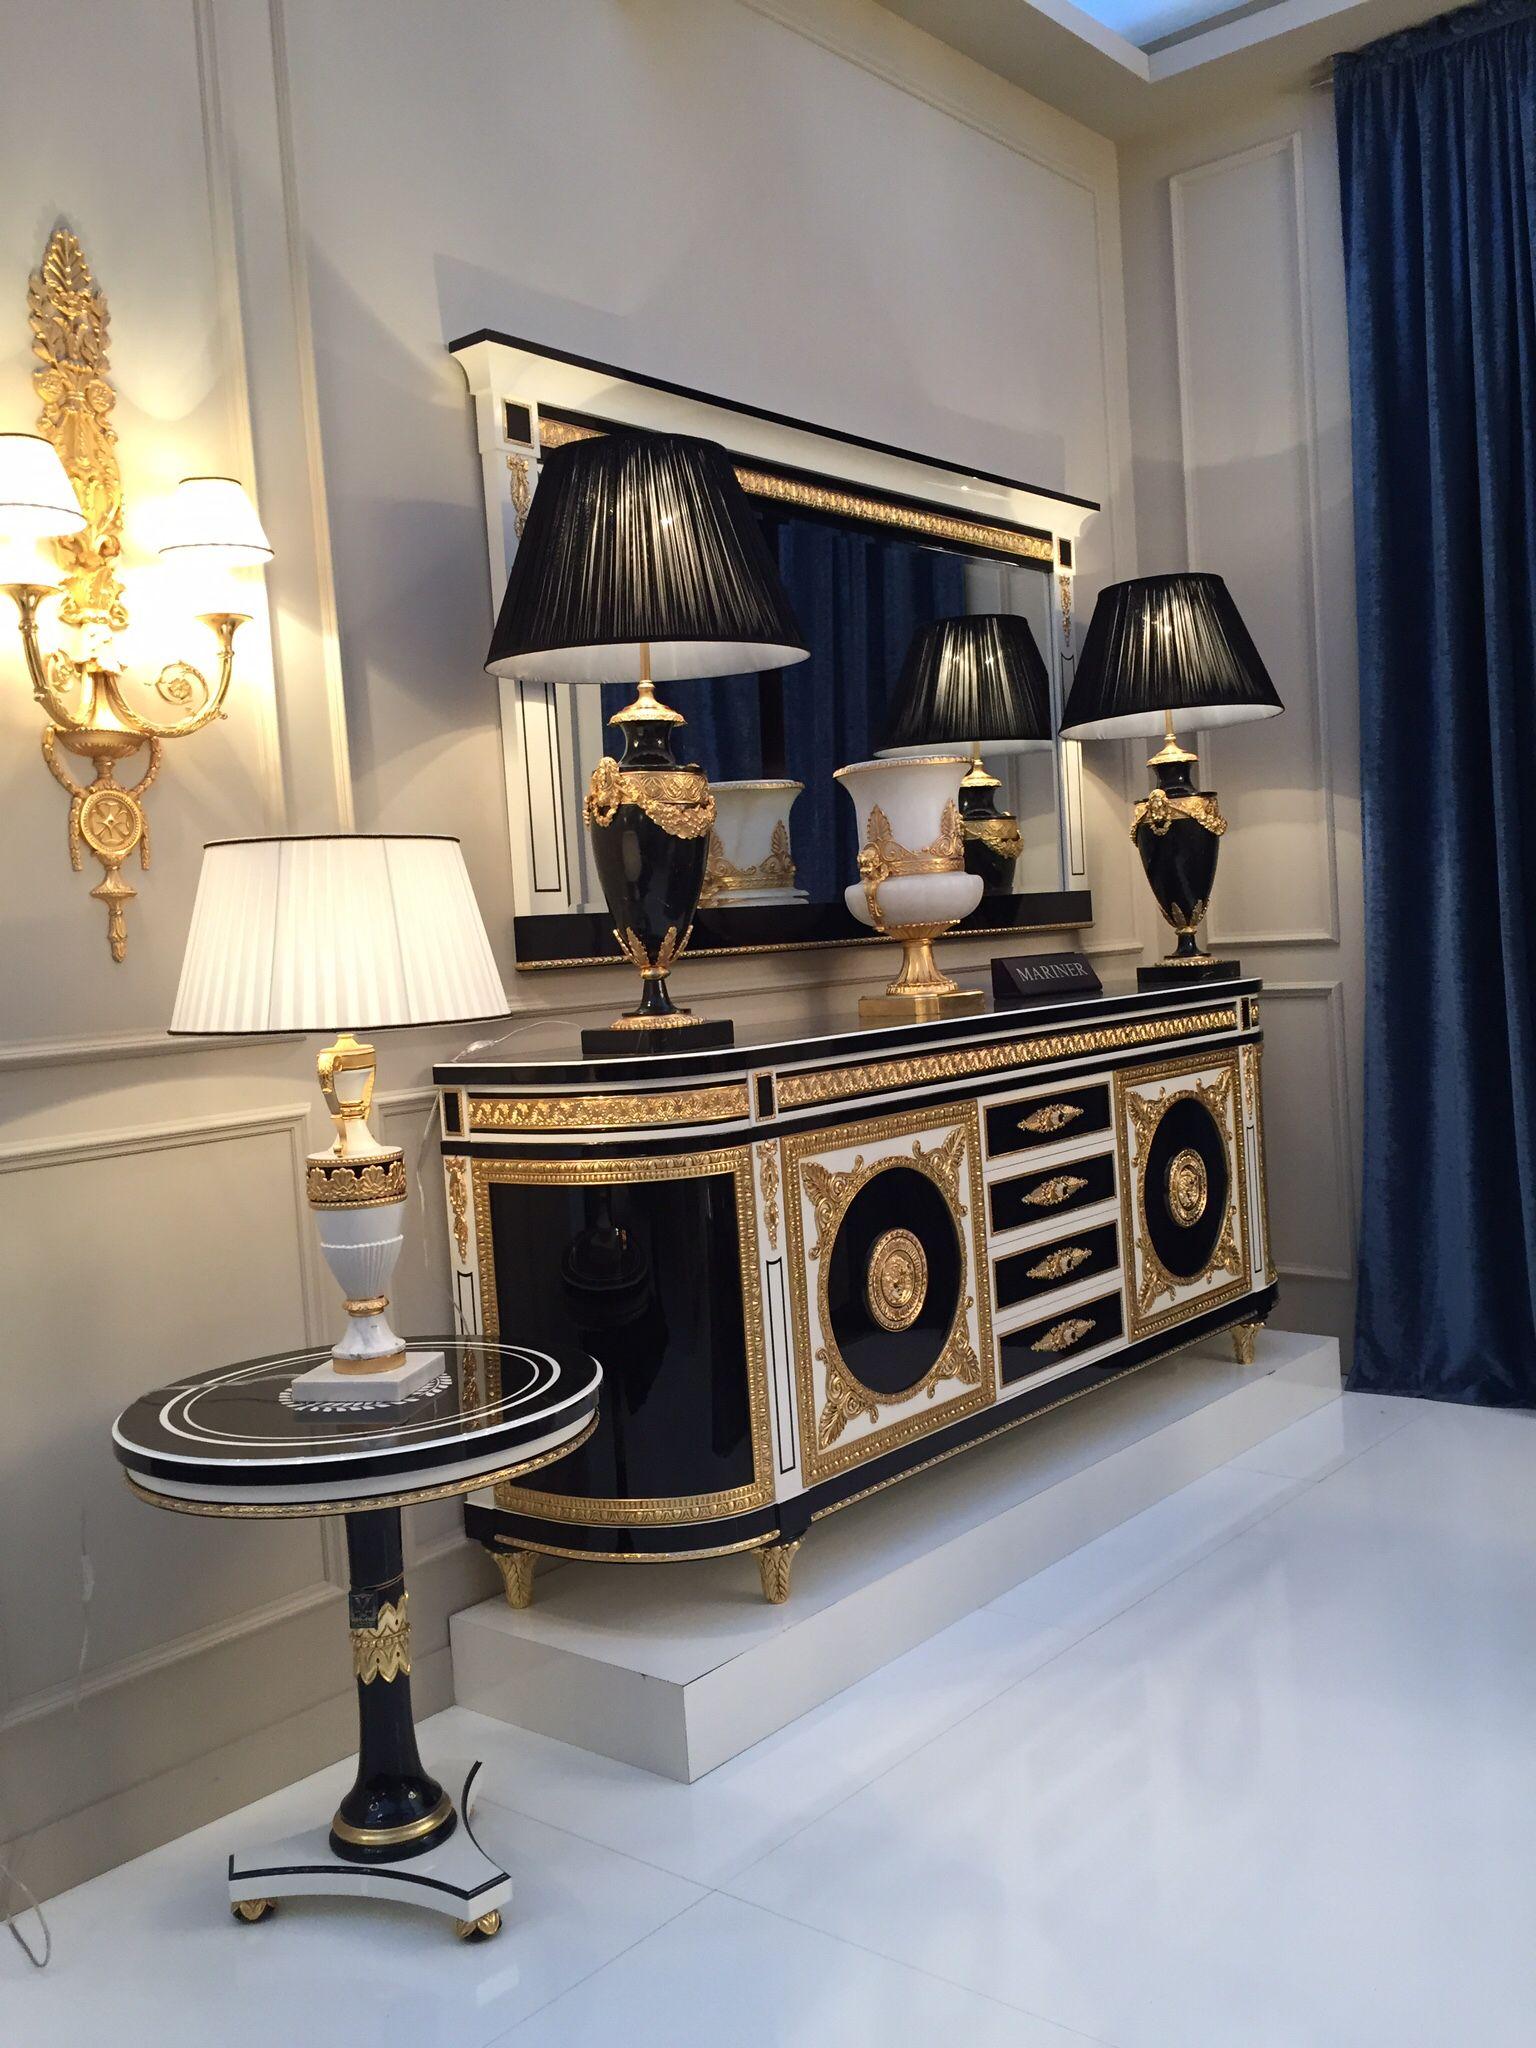 Milano 2015 Dining Room Design Luxury Living Room Design Decor Home Decor Furniture